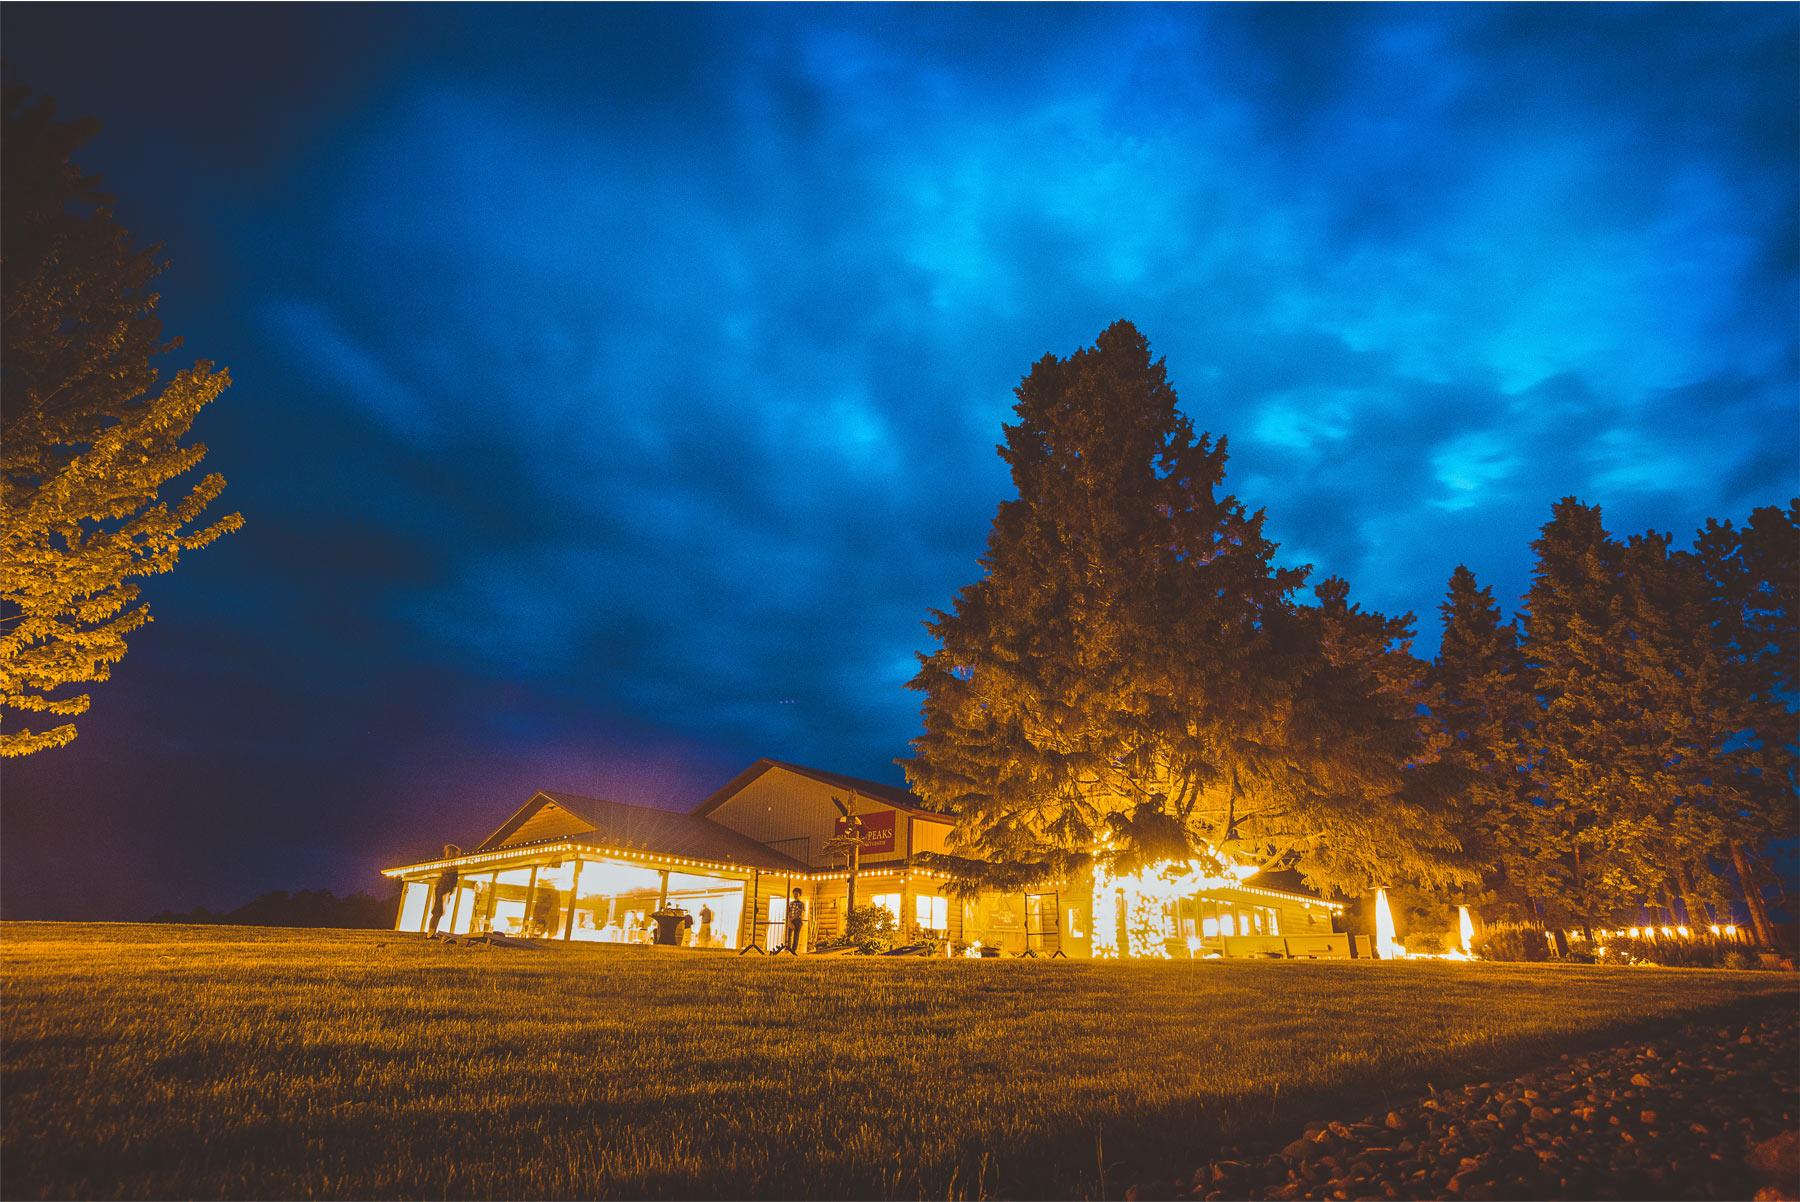 14-Vick-Photography-Wedding-Brainerd-Minnesota-Pine-Peaks-Lodge-Cabin-Rustic-Night-Kristi-and-Noel.jpg